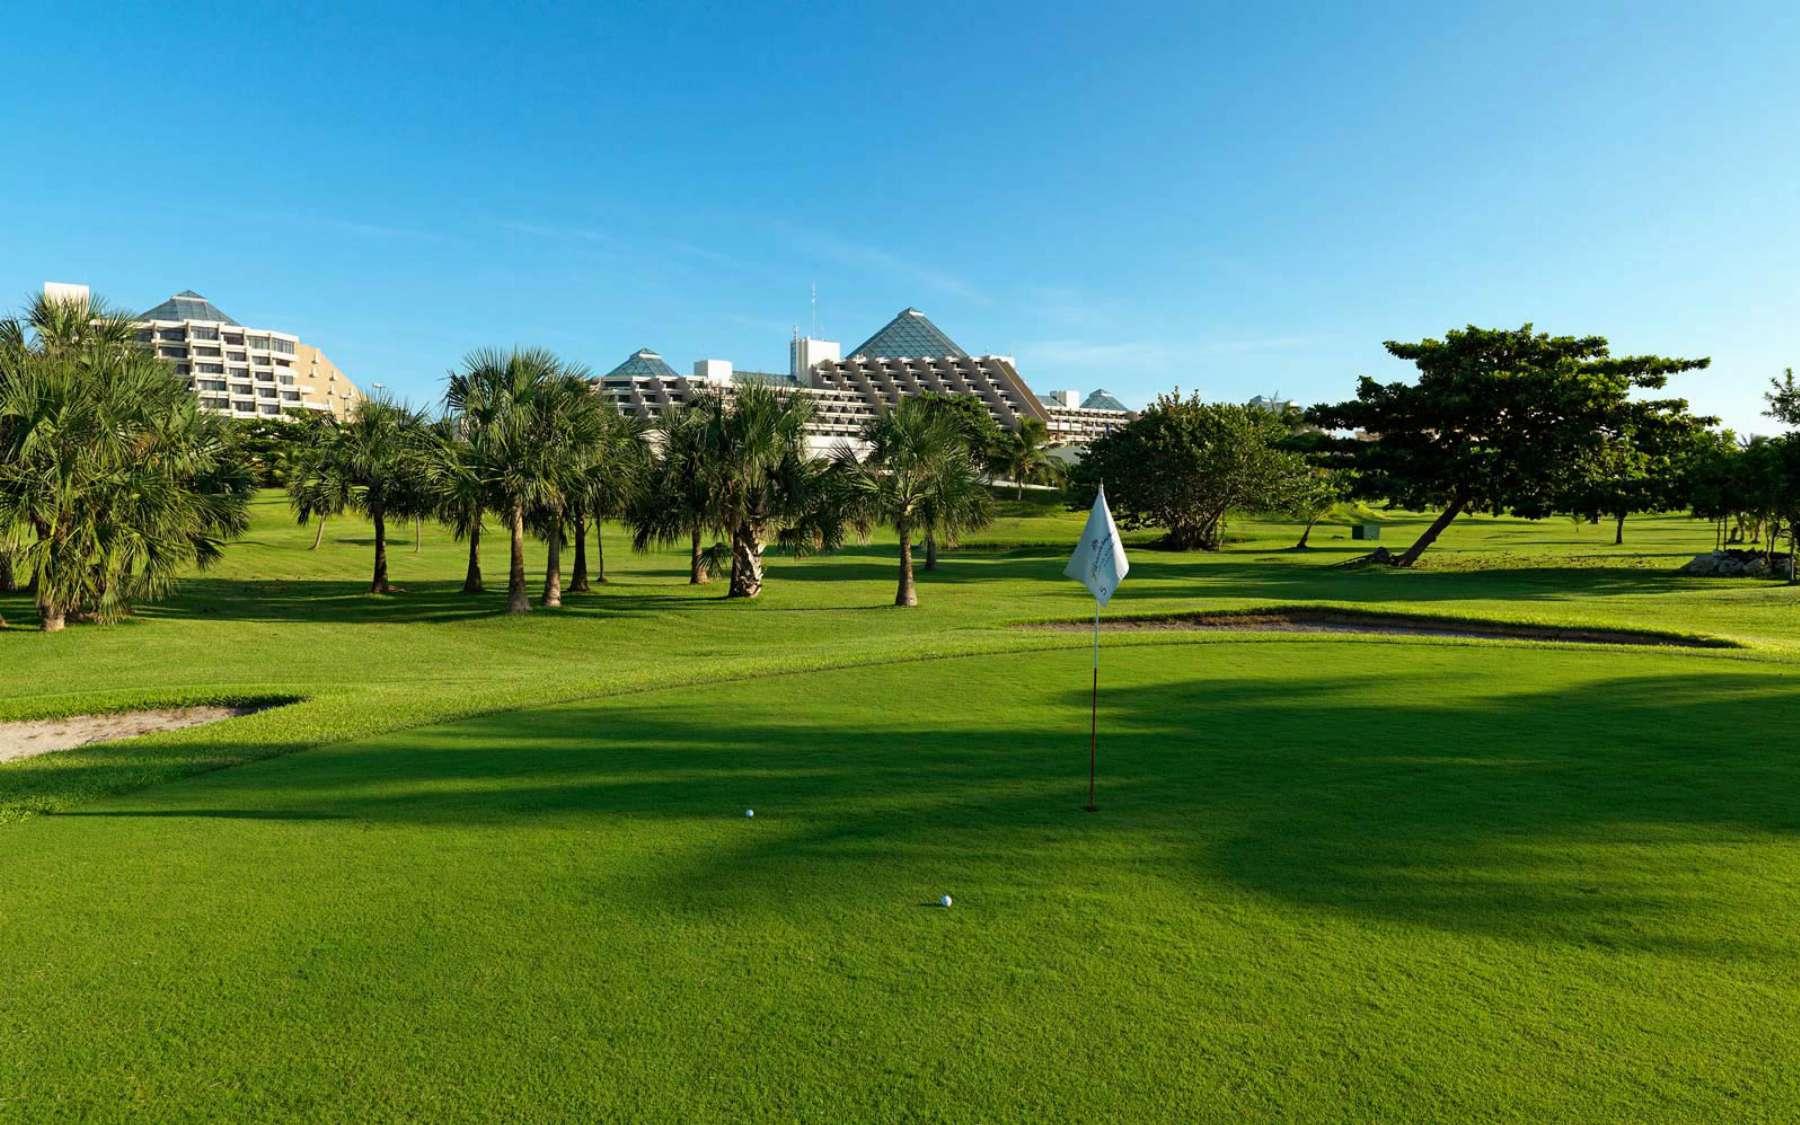 Golf Course at Paradisus Cancun